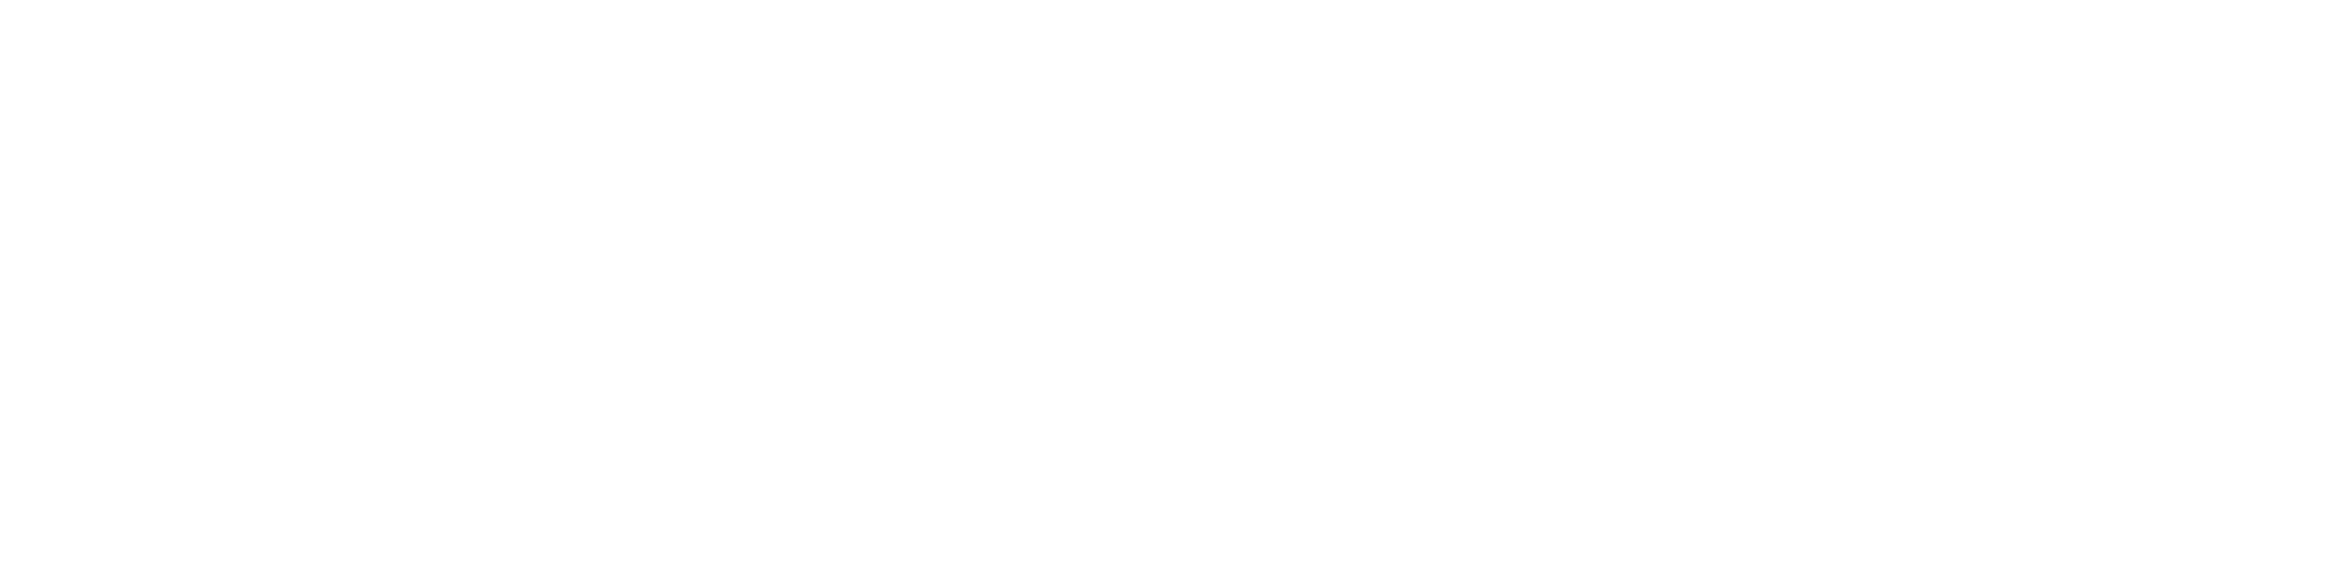 Descubra Guarapuava